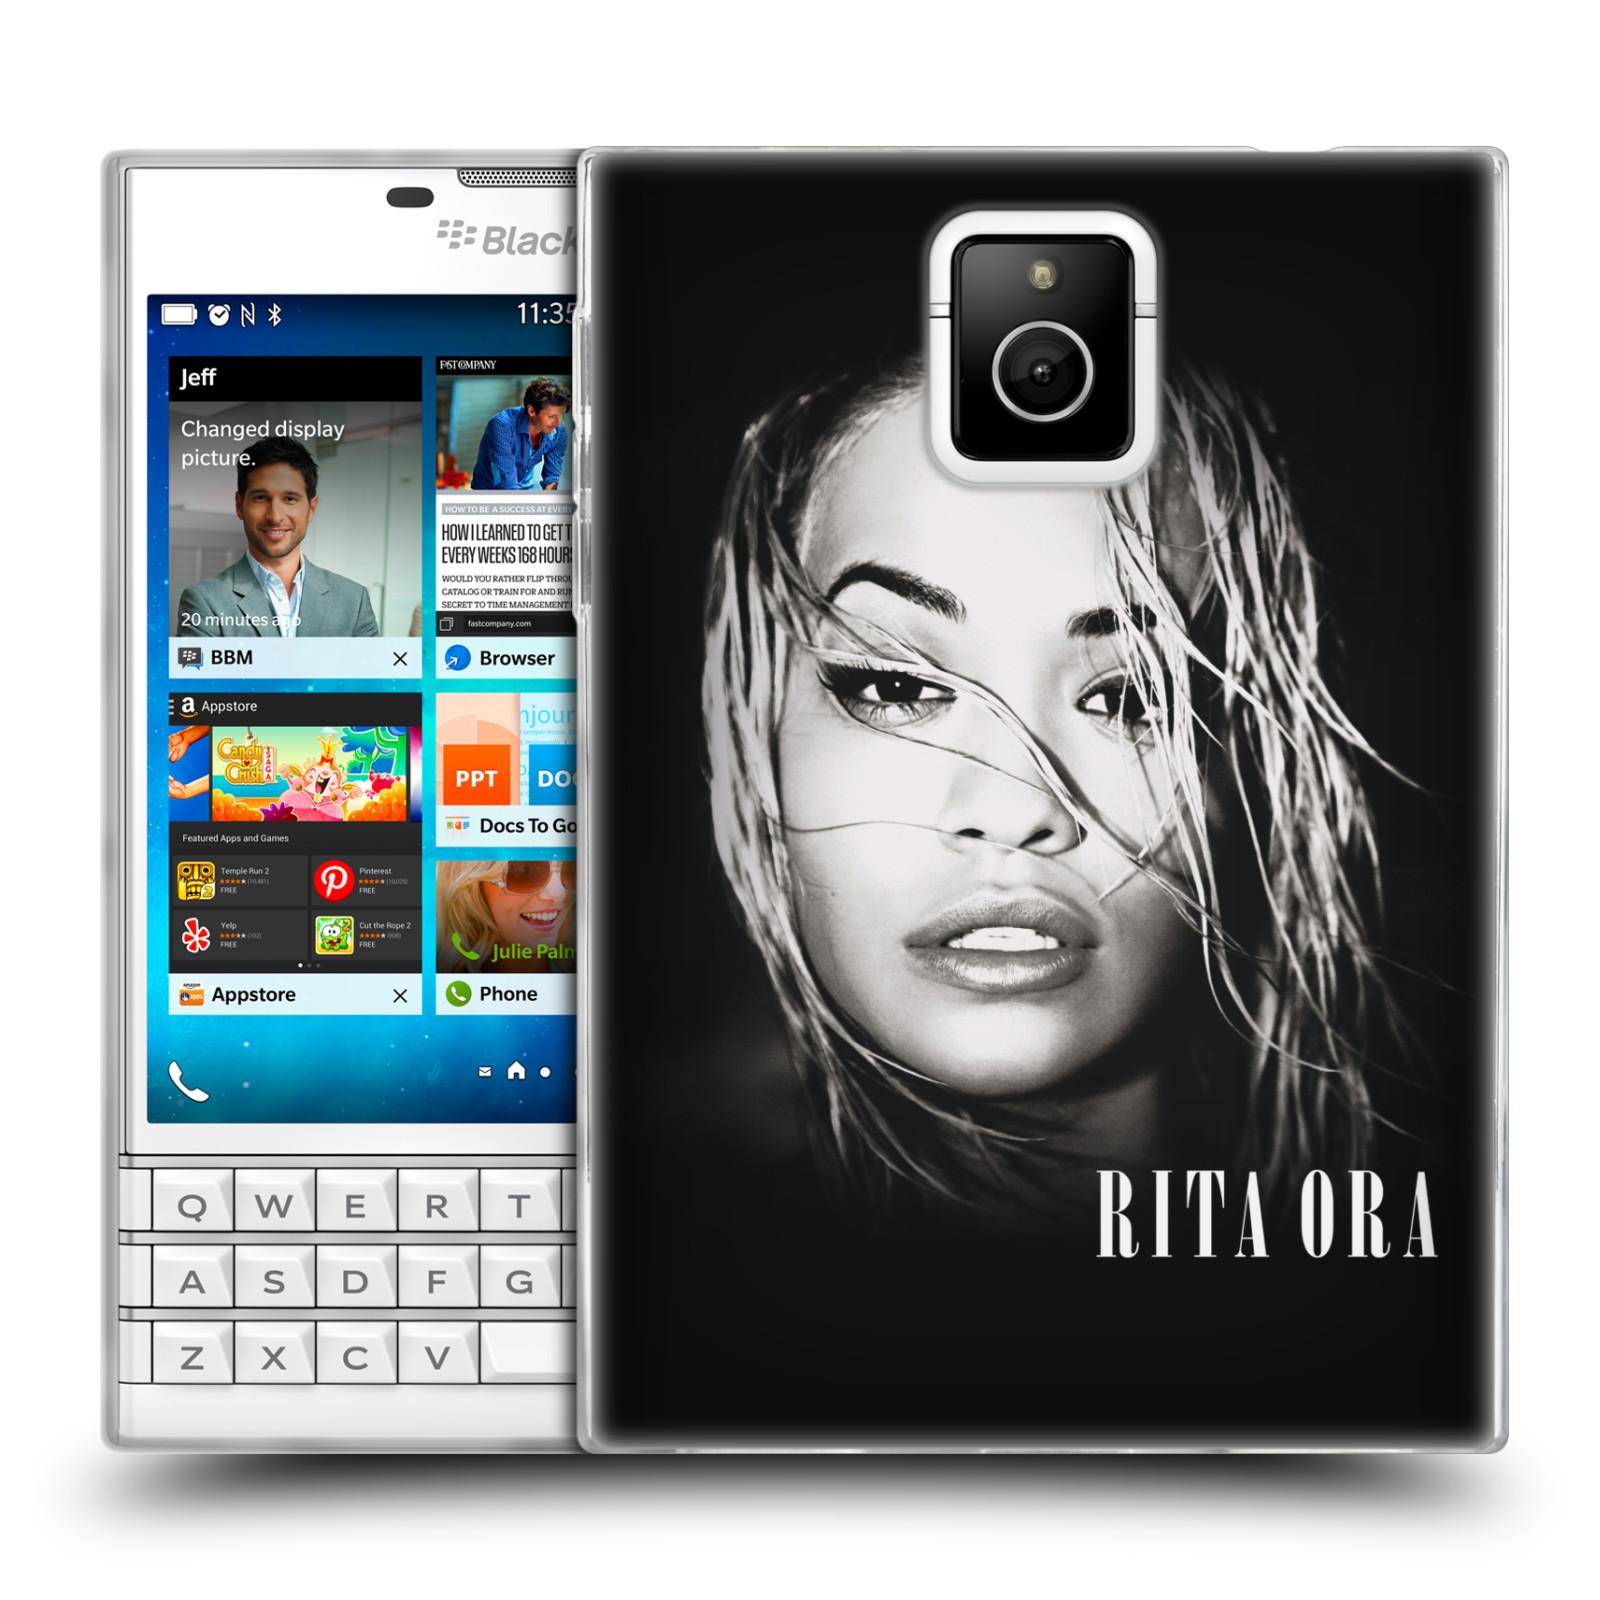 HEAD CASE silikonový obal na mobil Blackberry PASSPORT zpěvačka Rita Ora foto tvář